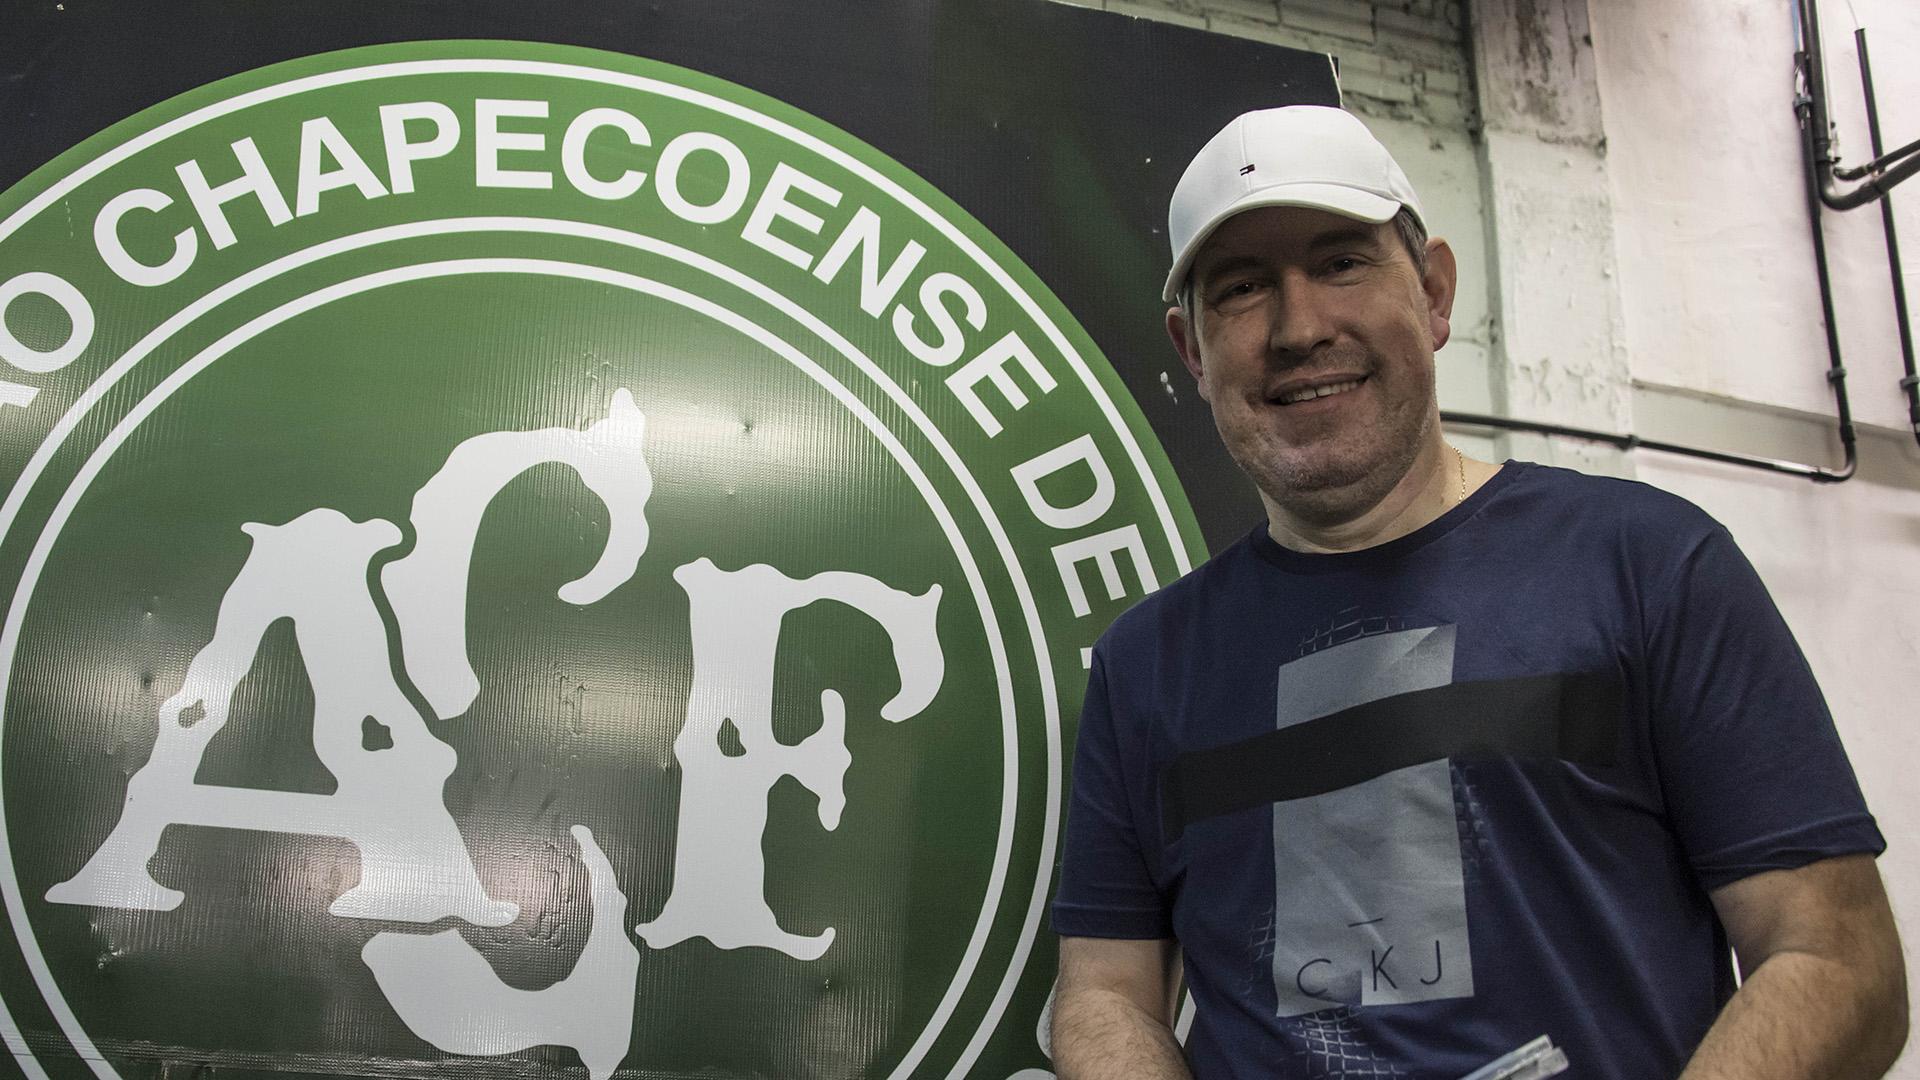 Rafael Henzel Chapecoense 20012017